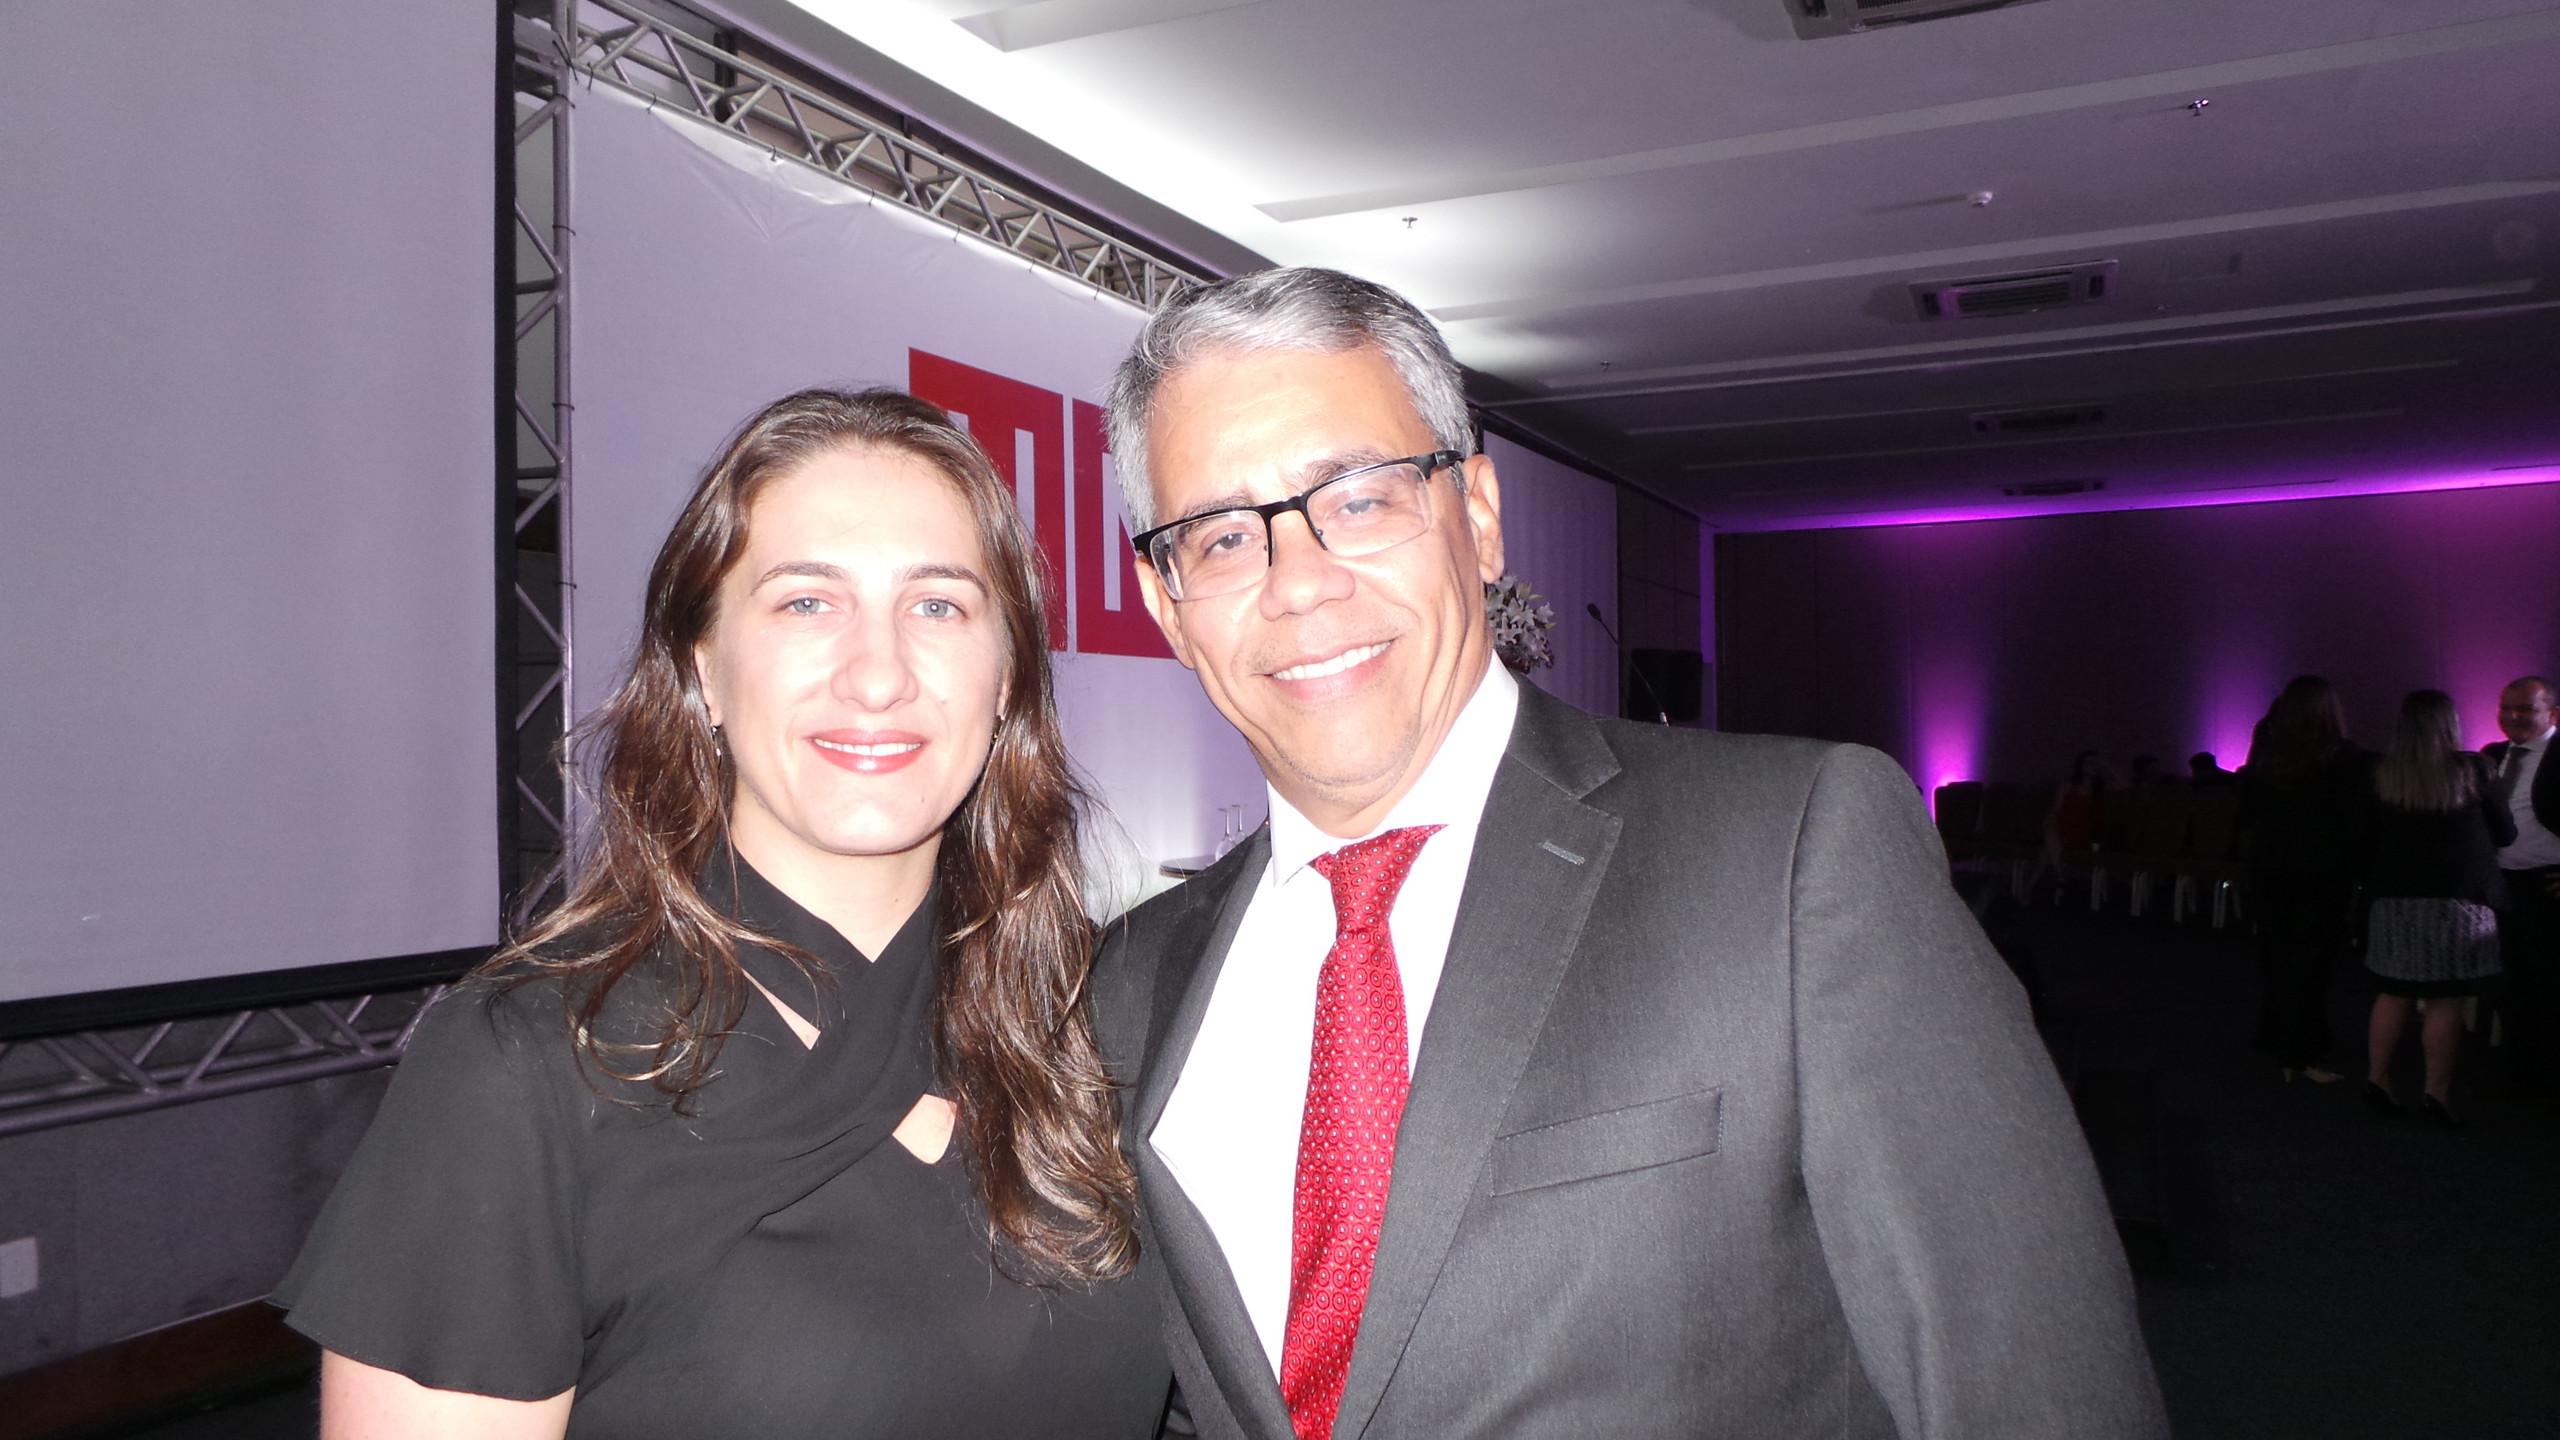 Daniele o o marido Des. Paulo Velten Pereira, palestrante da Jornada